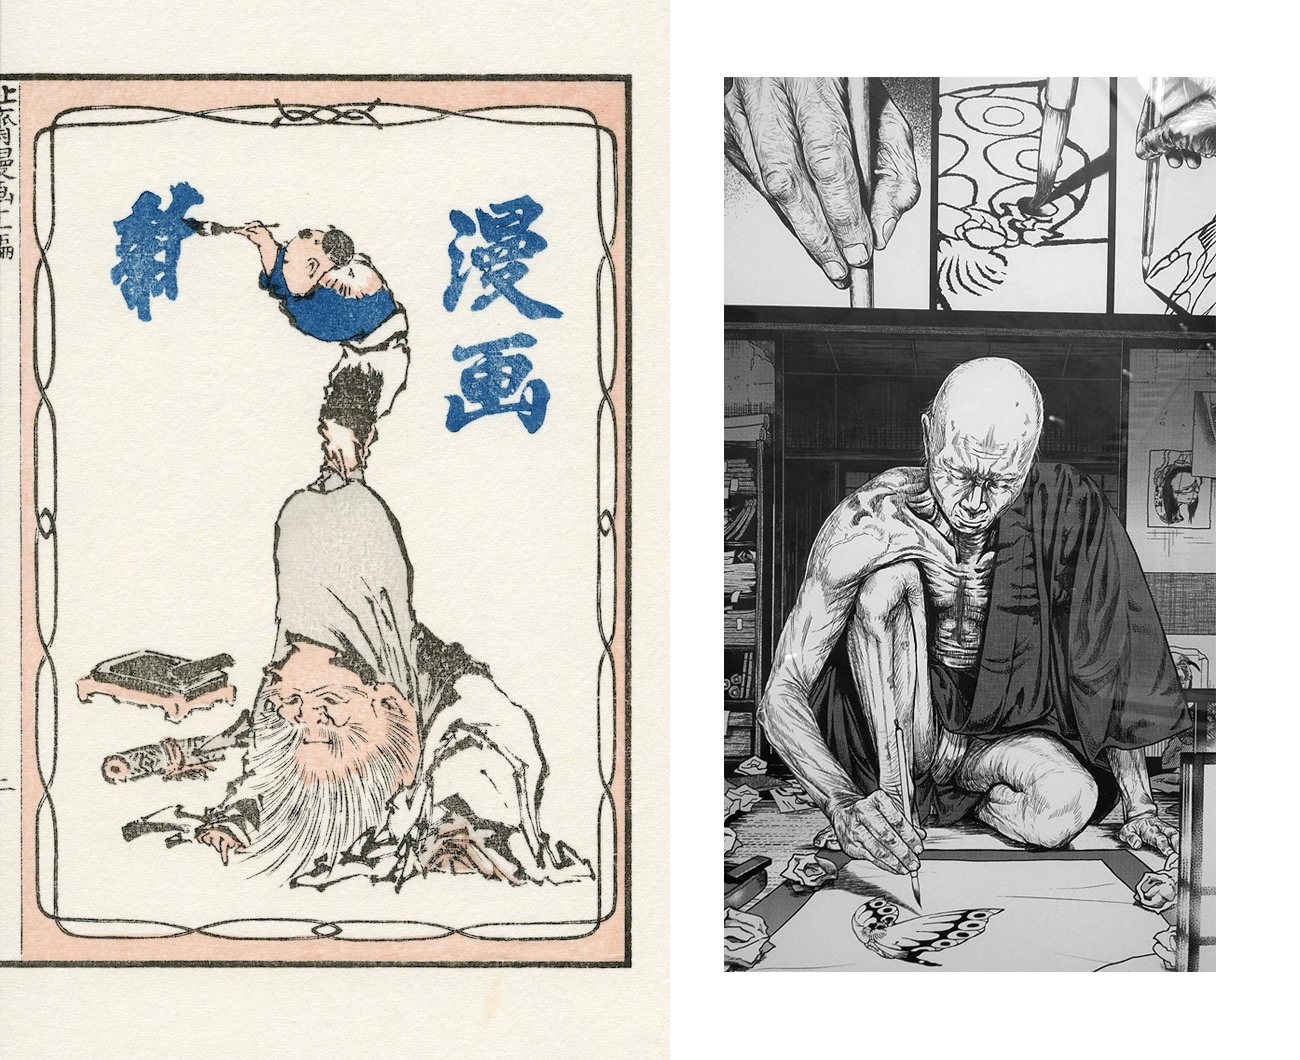 Katsushika Hokusai - Portraits